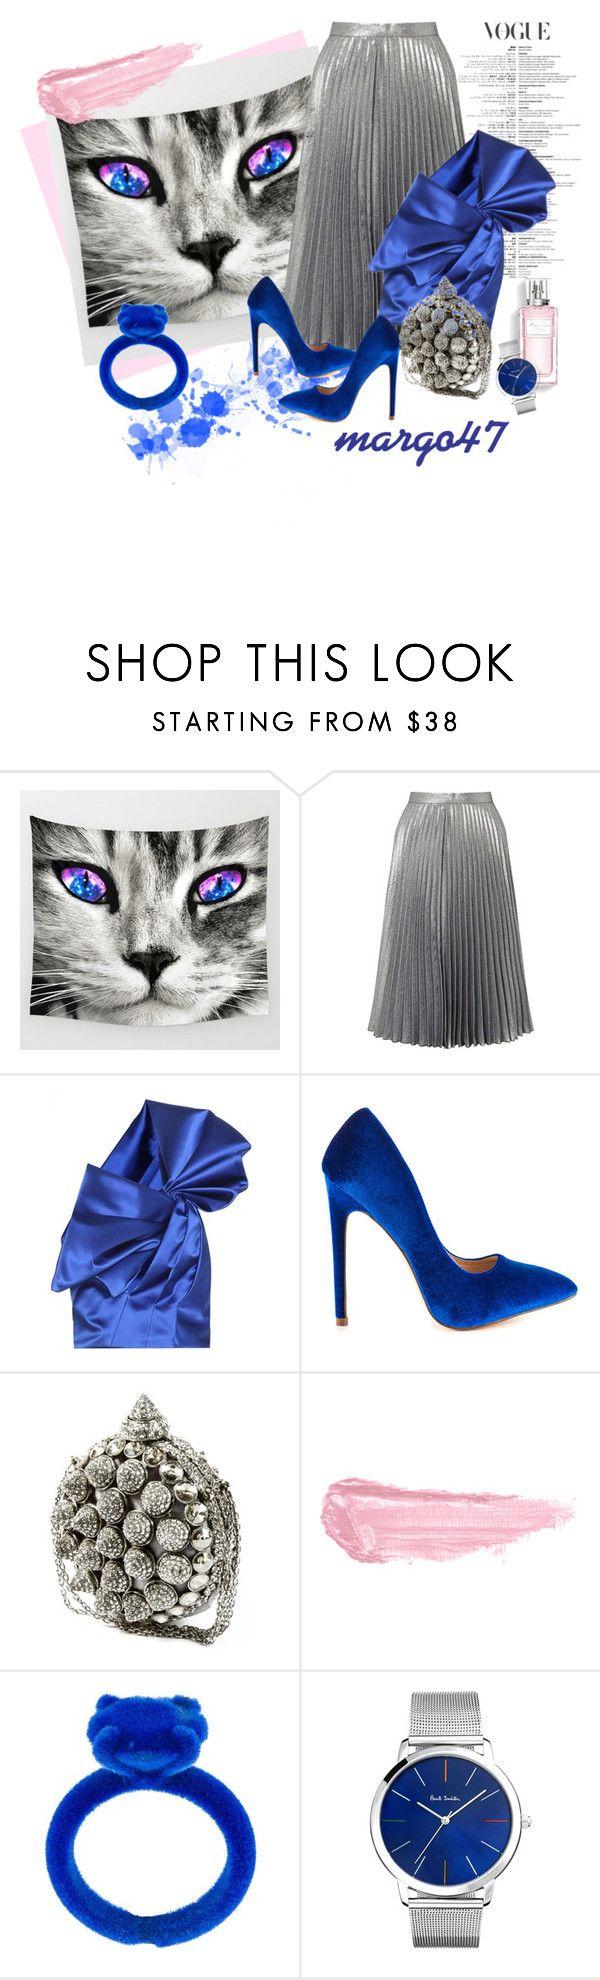 """kocie oczy"" by margo47 ❤ liked on Polyvore featuring Miss Selfridge, Yves Saint Laurent, Liliana, By Terry, Christian Dior, MM6 Maison Margiela and Paul Smith"